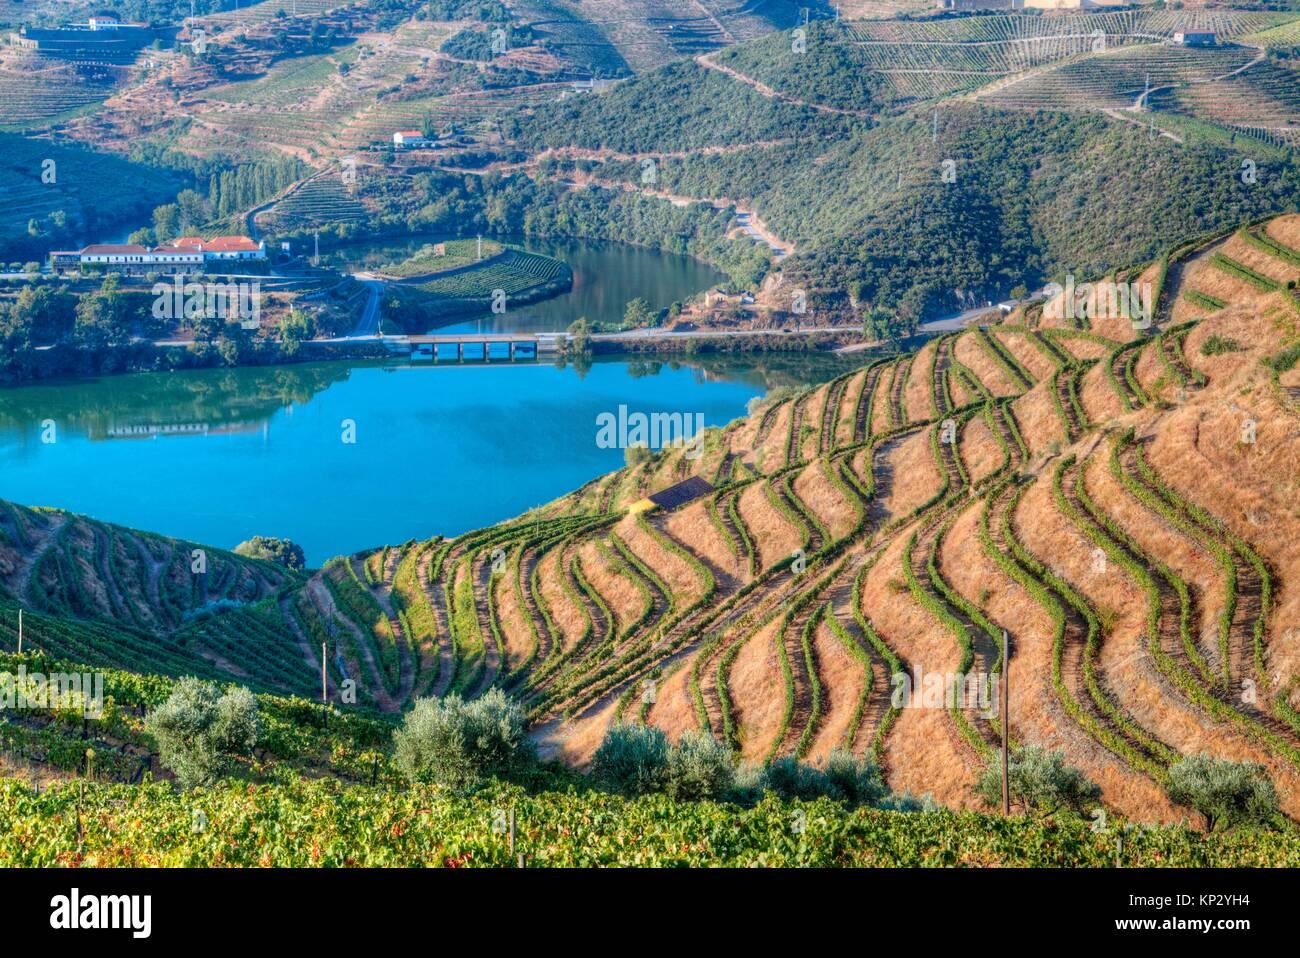 Vineyards and the Douro River, Alto Douro Wine Valley, UNESCO World Hertiage Region, Portugal - Stock Image